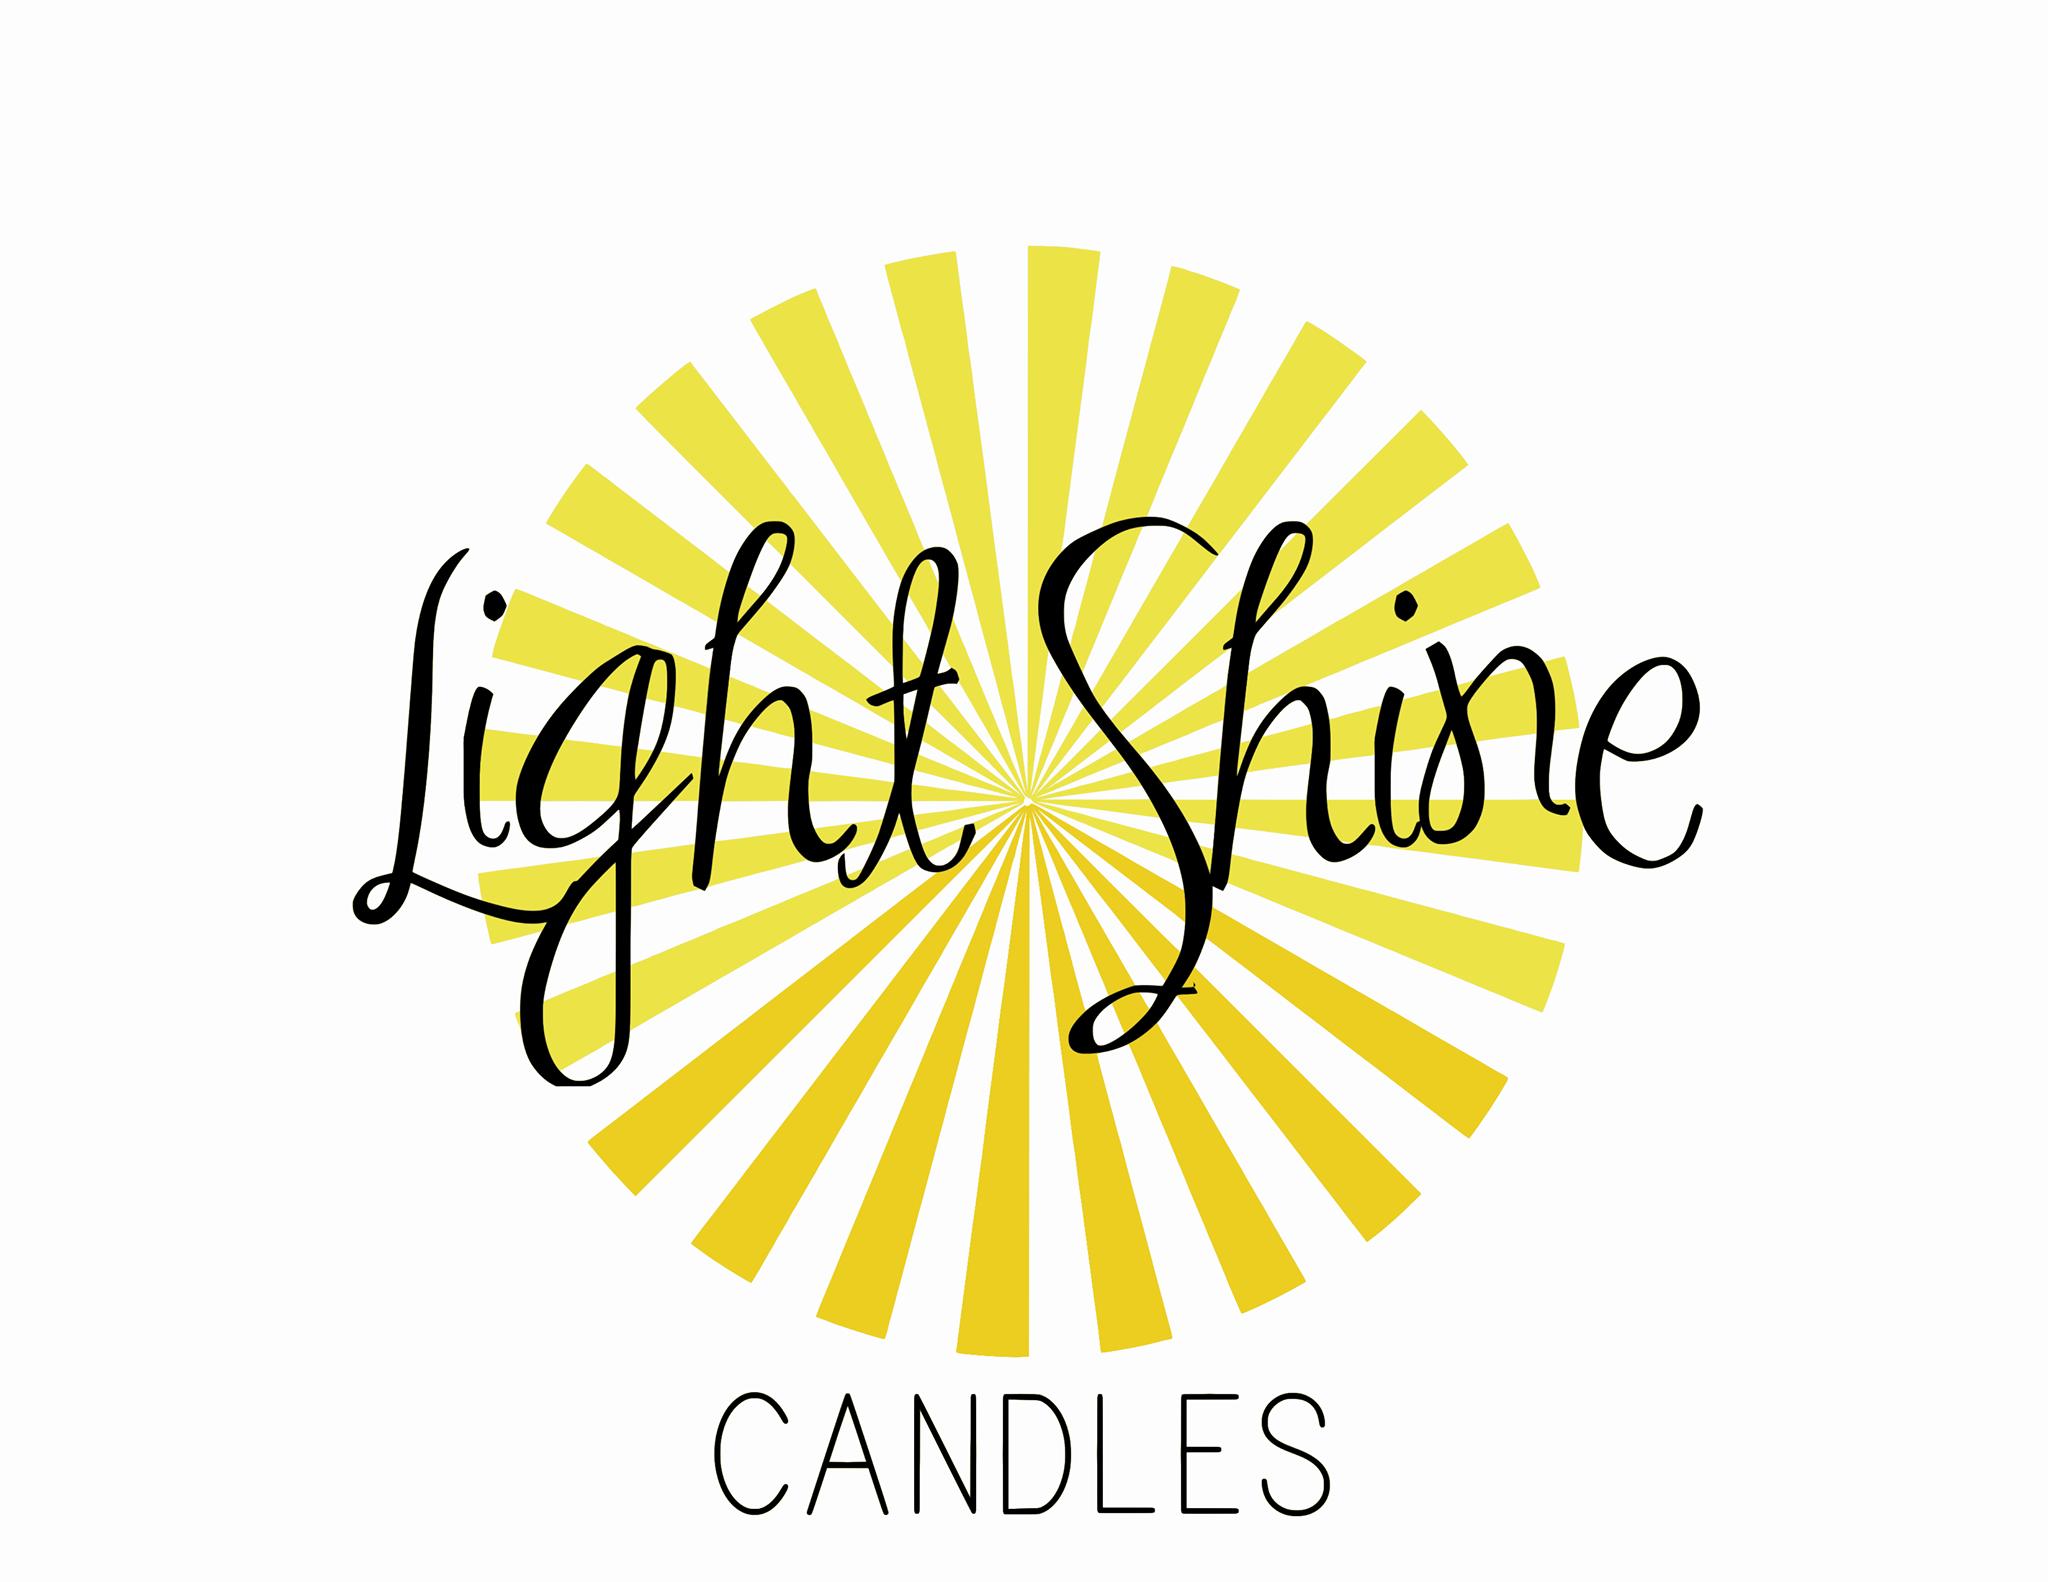 Light Shine Candles